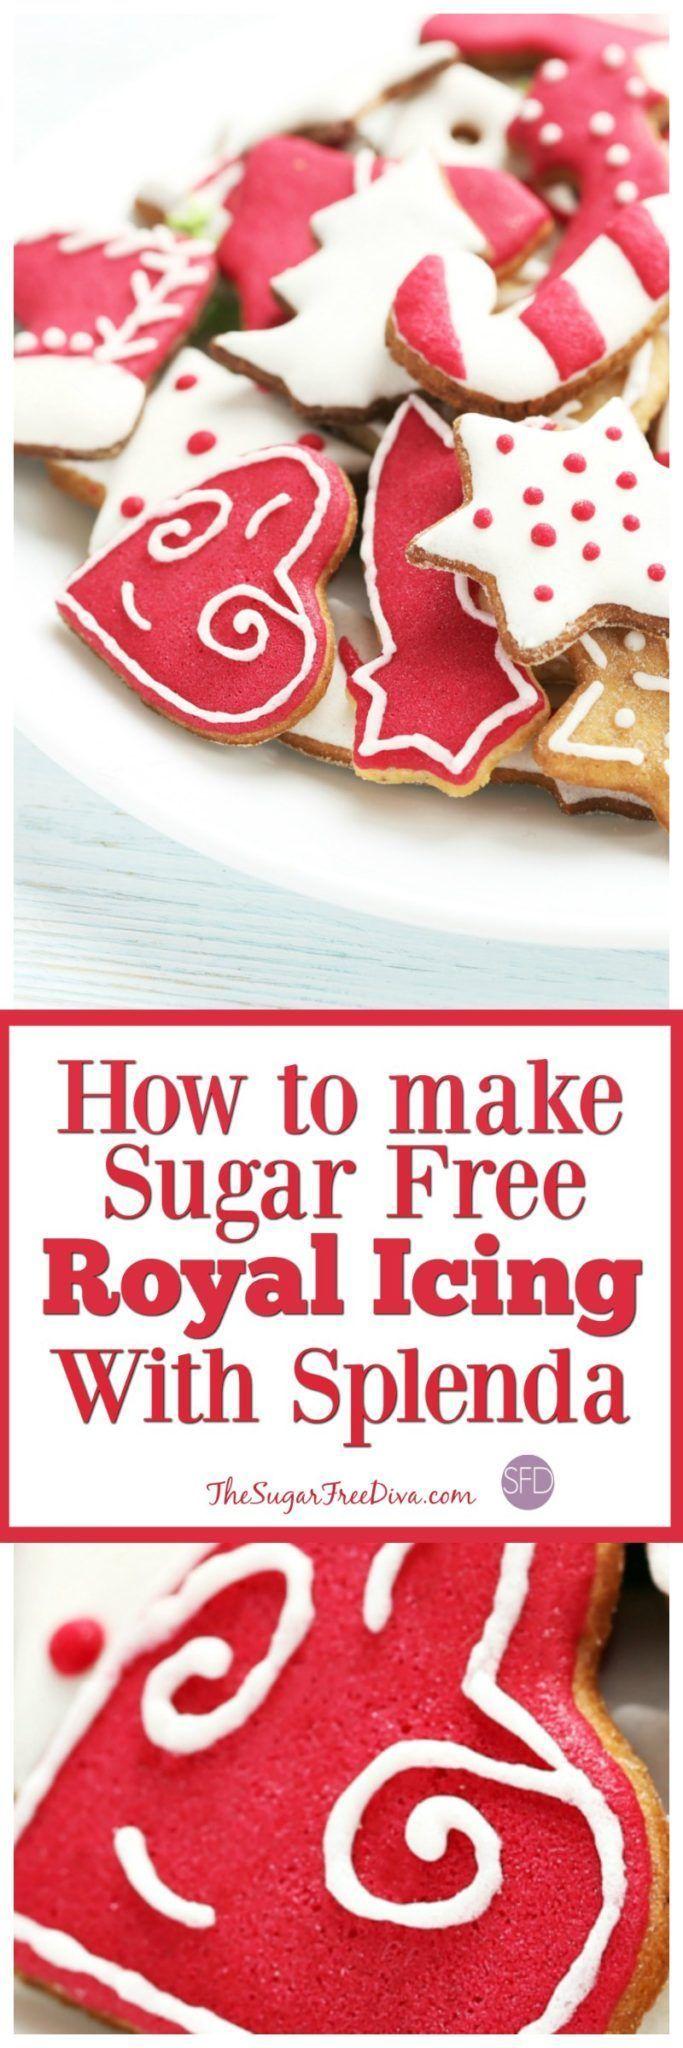 How to Make Sugar Free Royal Icing with Splenda